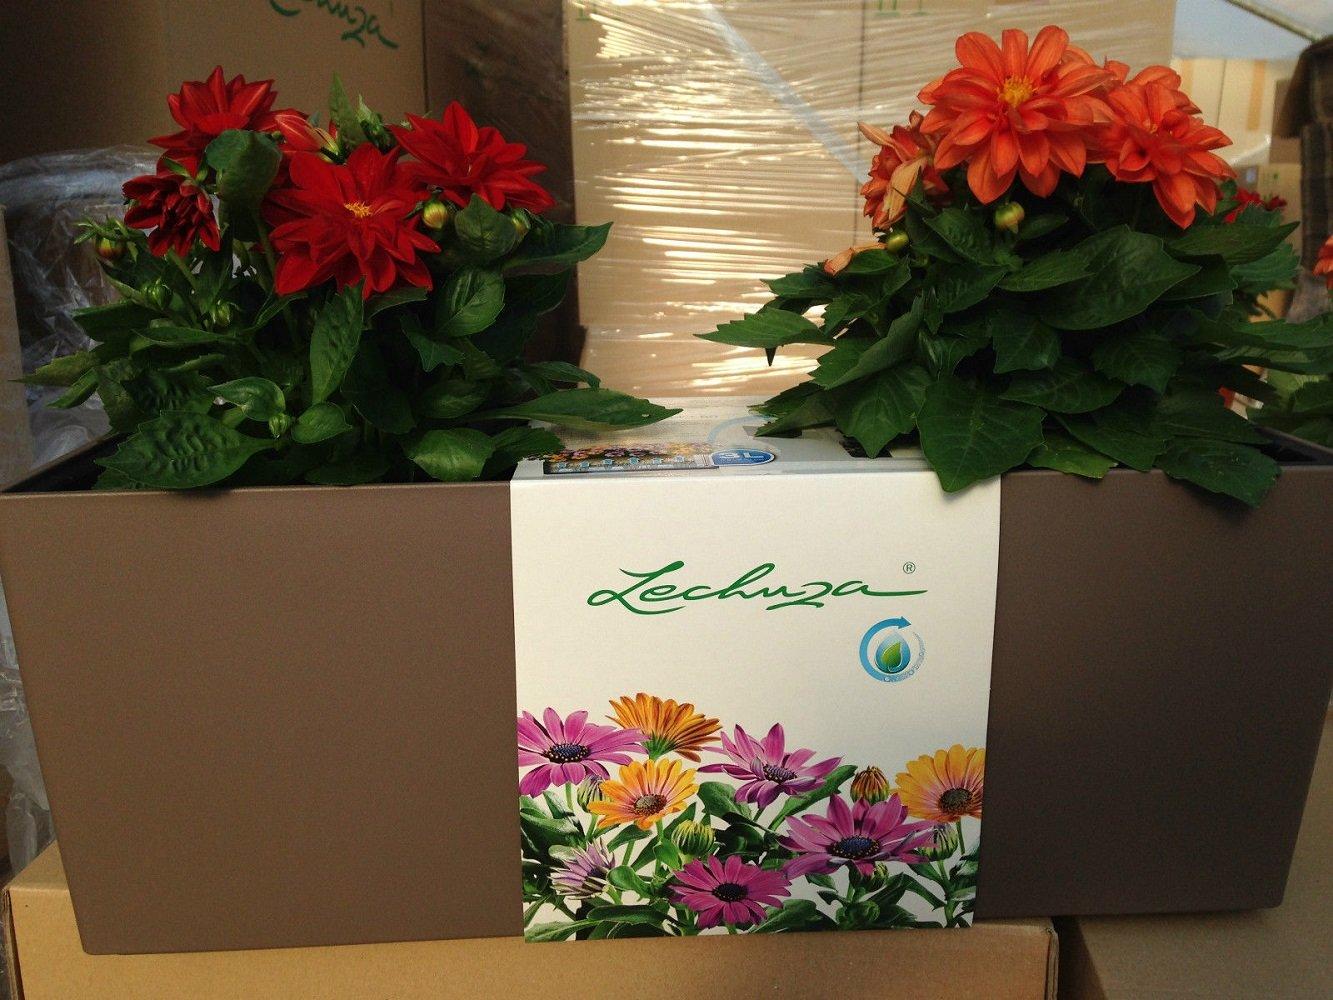 4 x Lechuza Balconera 50 Color Muskat Komplettset Balkonkasten Blumenkasten Neu